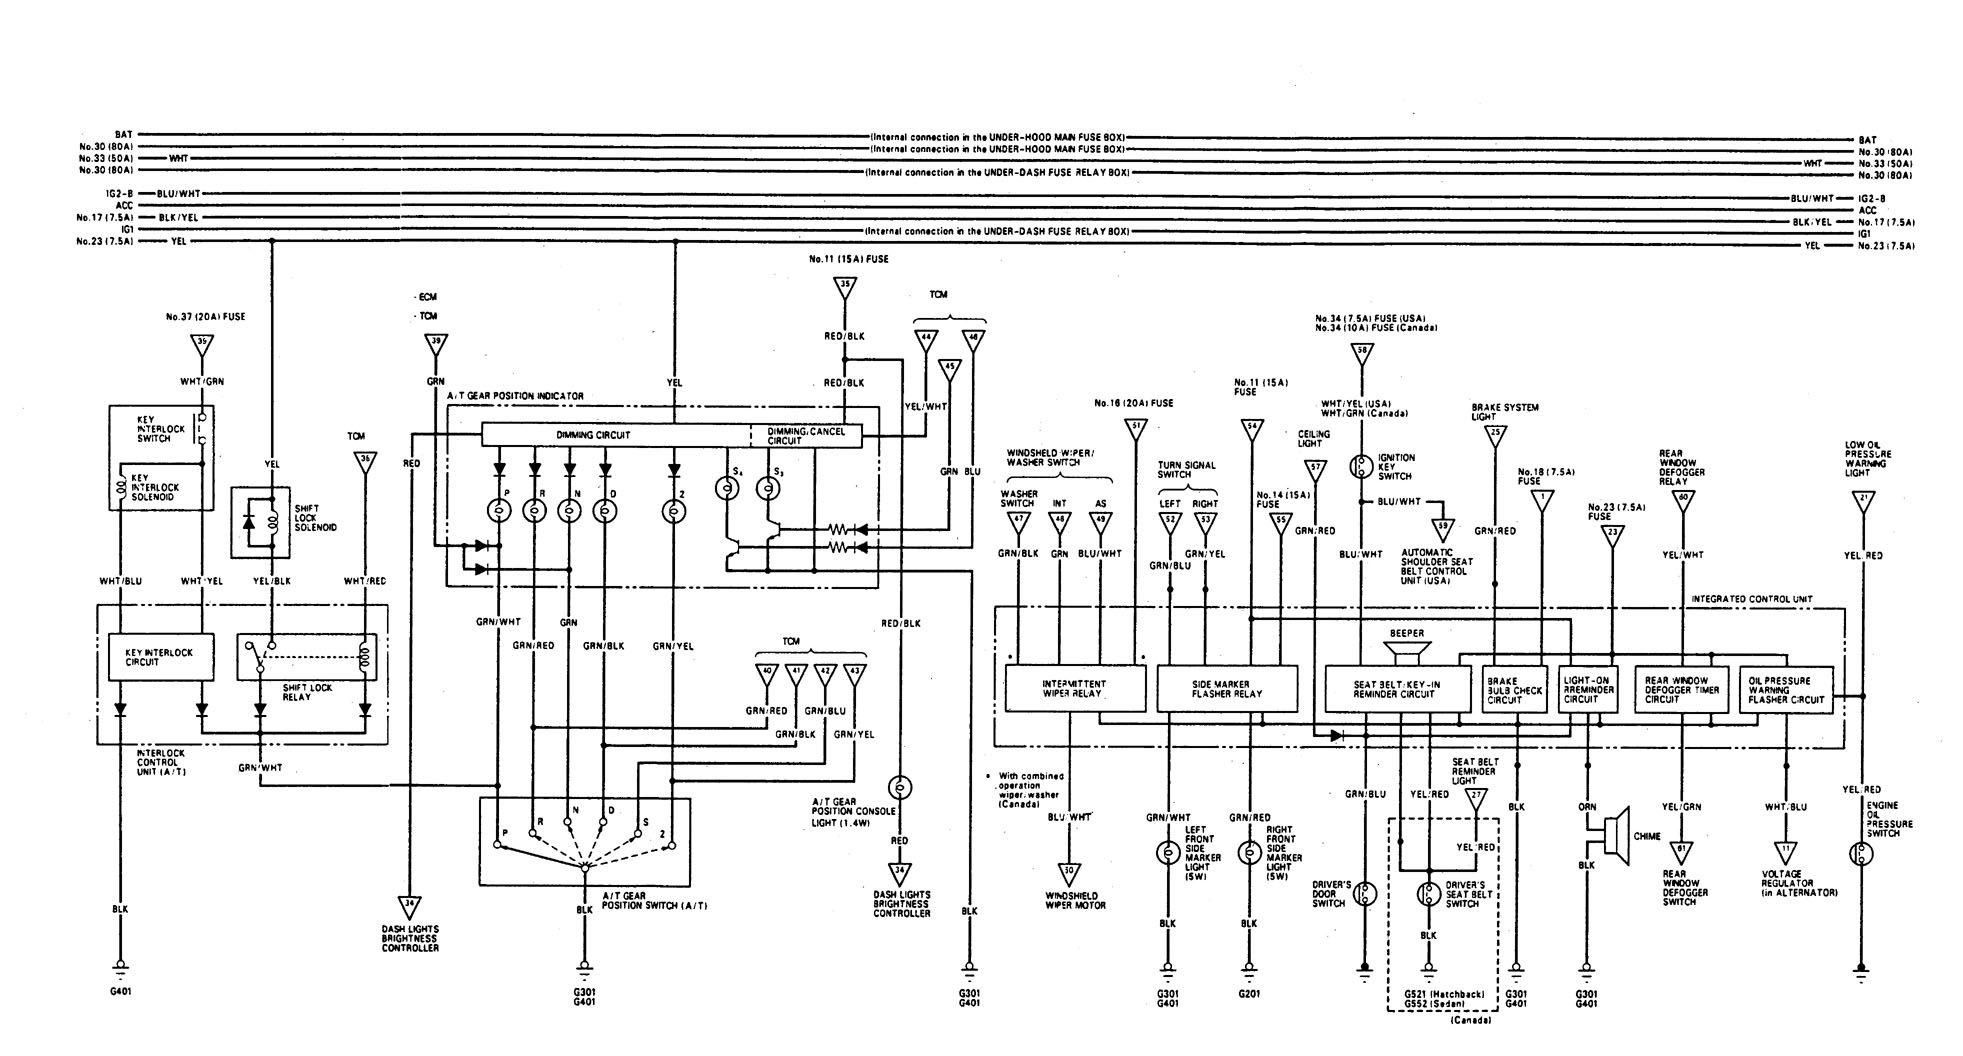 Acura Integra  1993  - Wiring Diagrams - Shift Interlock